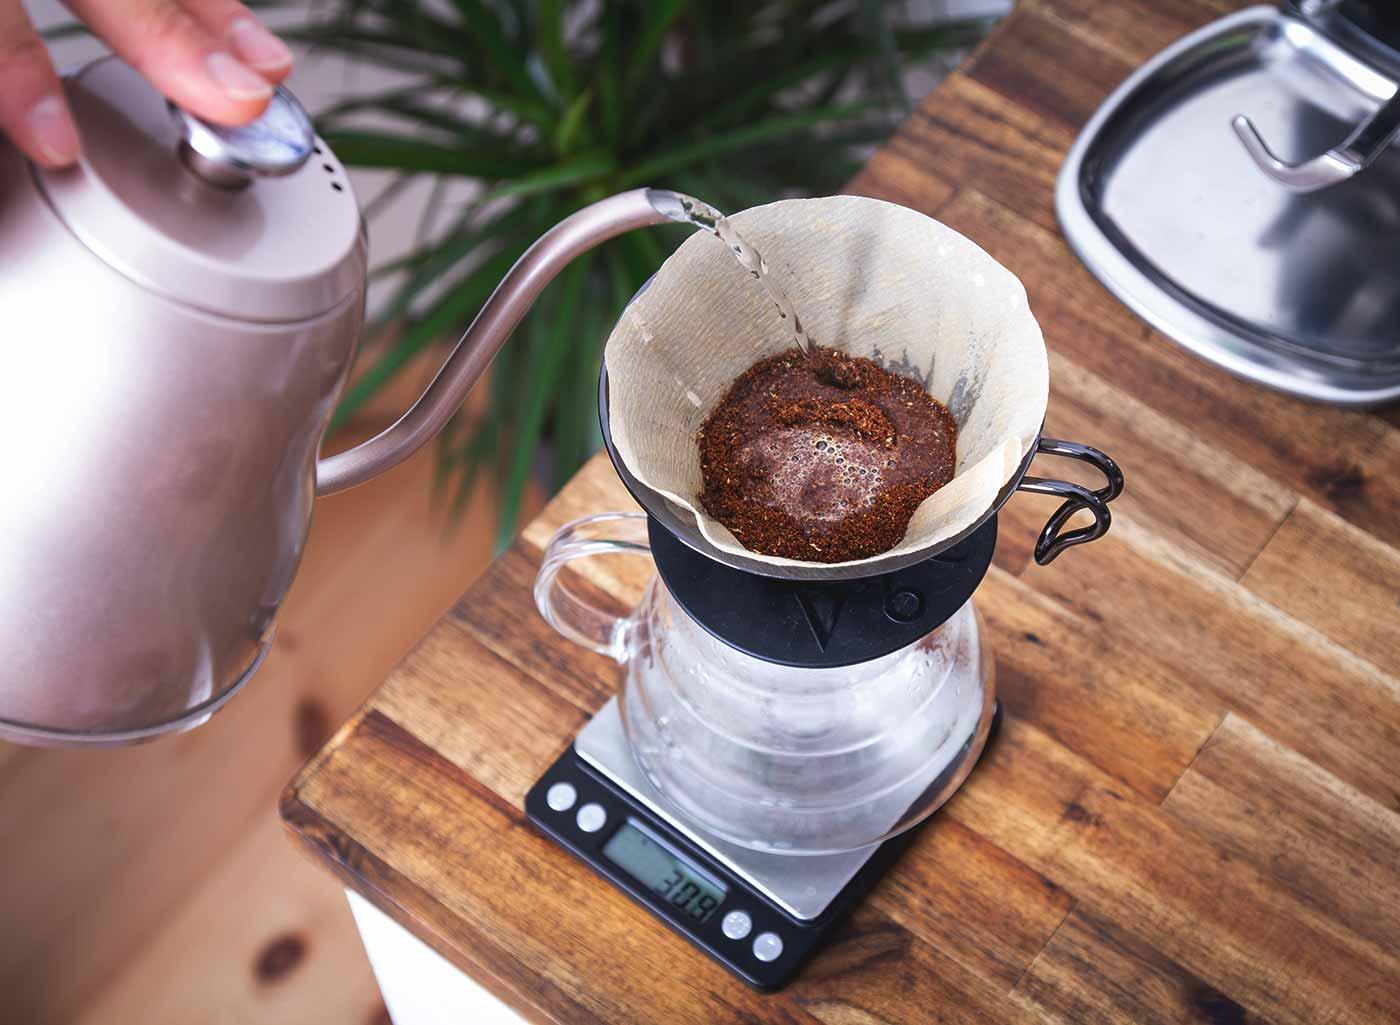 Schritt 4: Kaffee extrahieren. Kaffeezubereitung mit dem Hario V60 Handfilter.